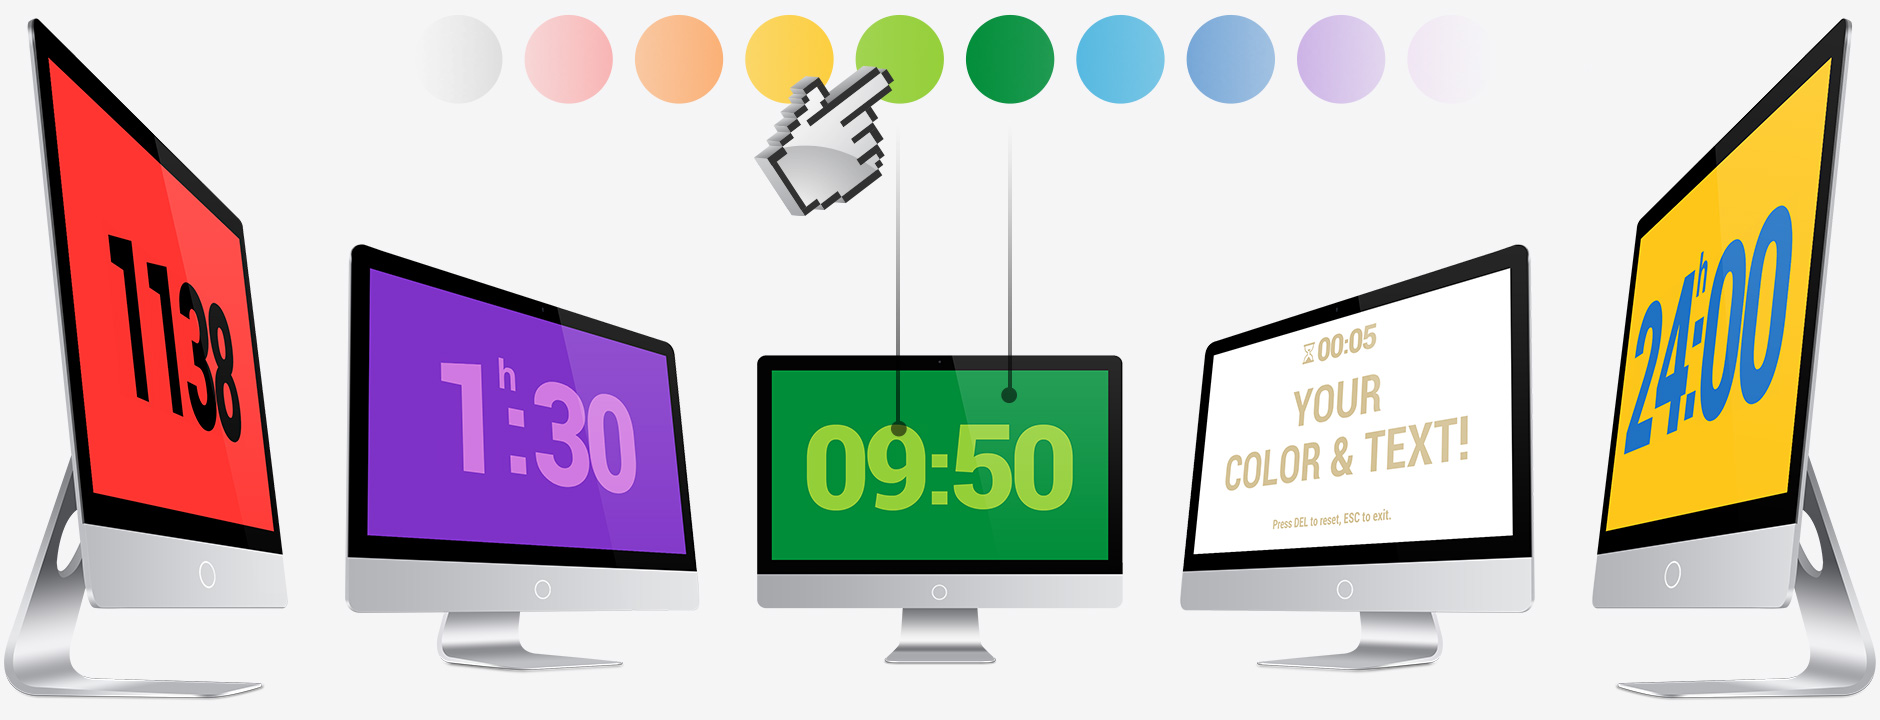 timer-choose-color-palette@2x